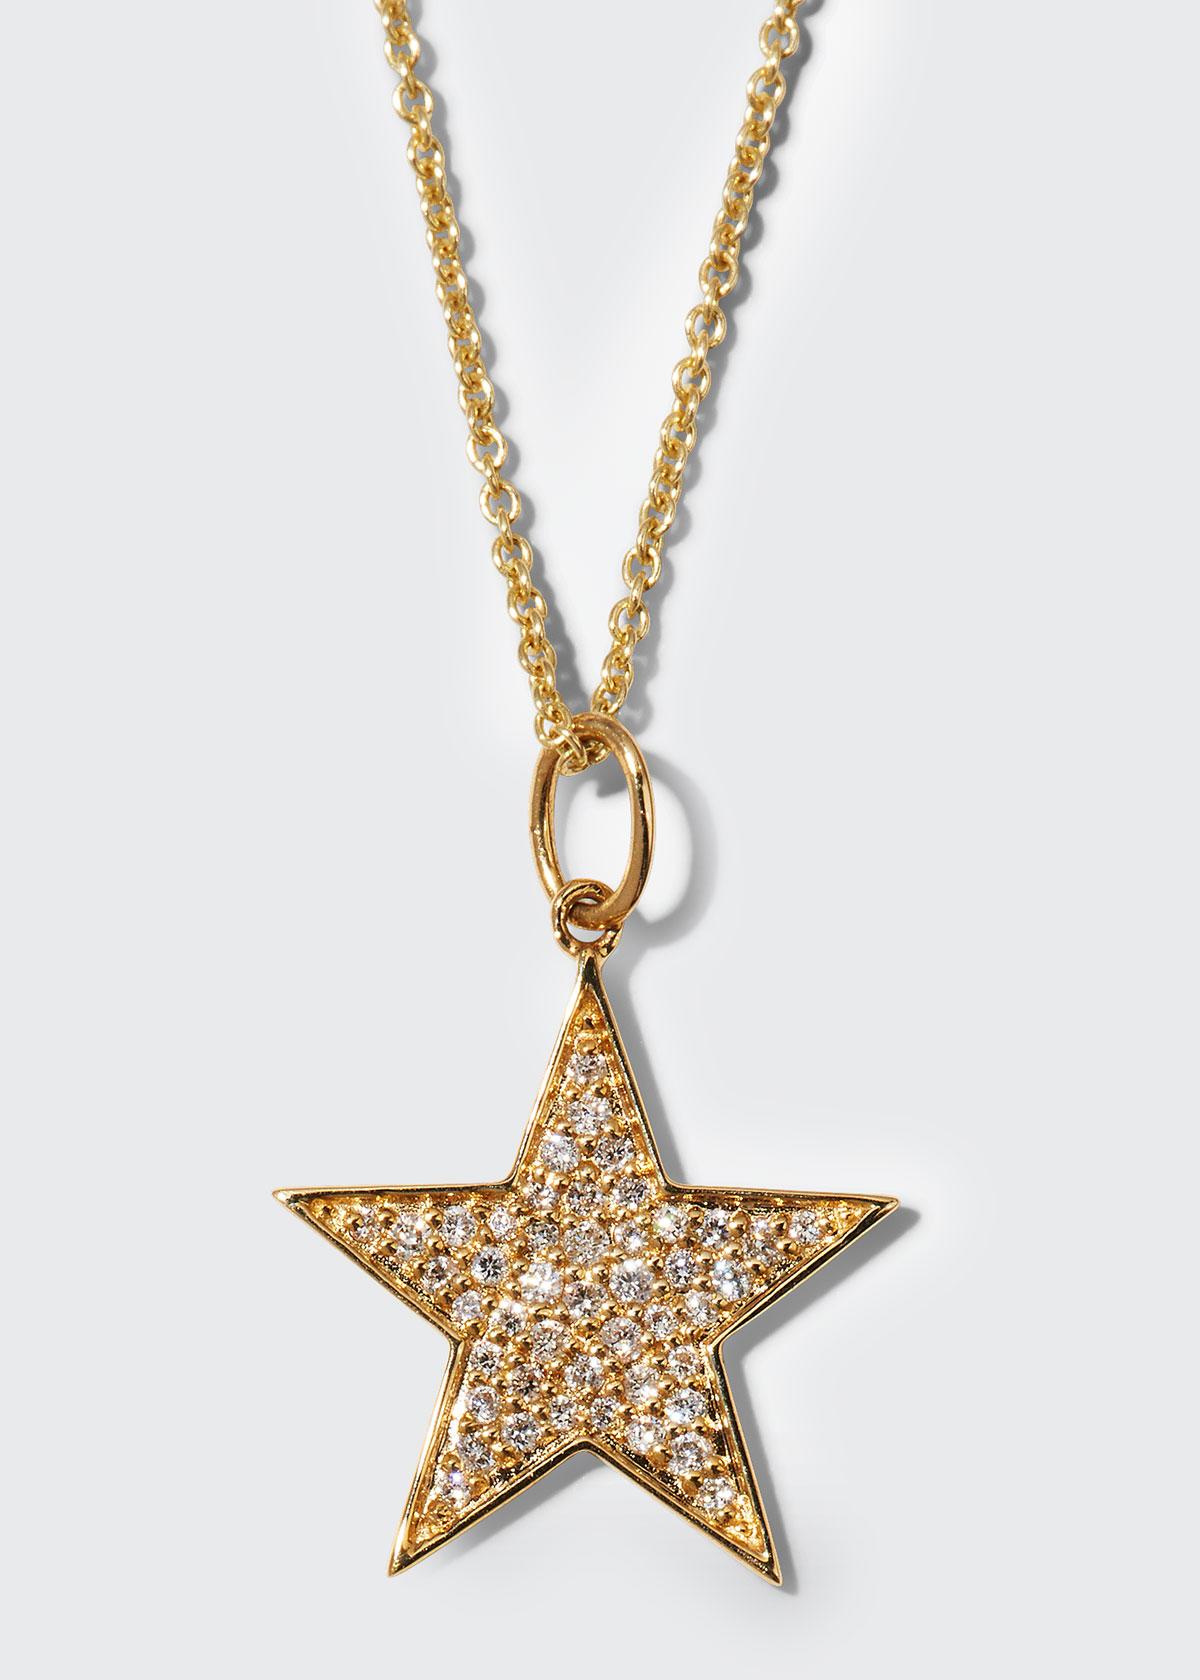 Sydney Evan Accessories 14K MEDIUM DIAMOND STAR CHARM NECKLACE